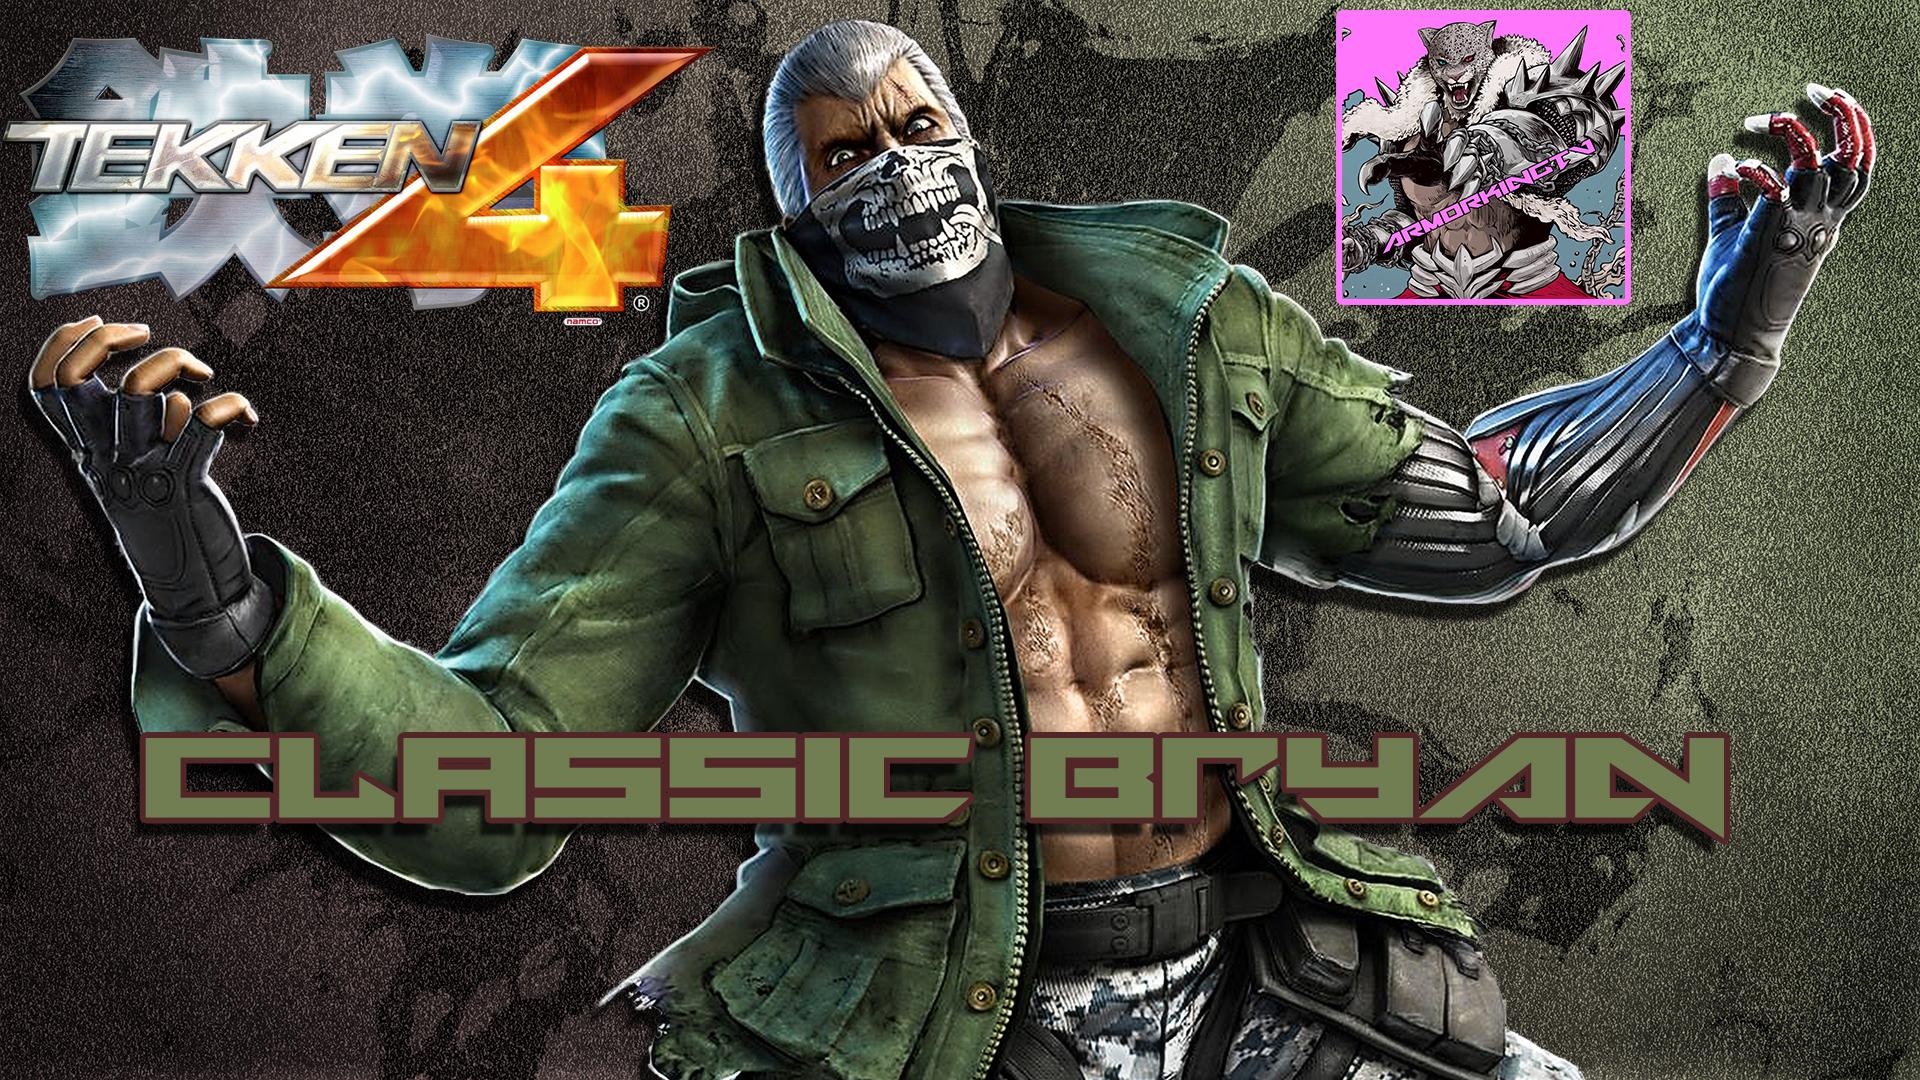 Bryan Fury Classic Sounds Mod For Tekken 7 By Armorkingtv21 On Deviantart